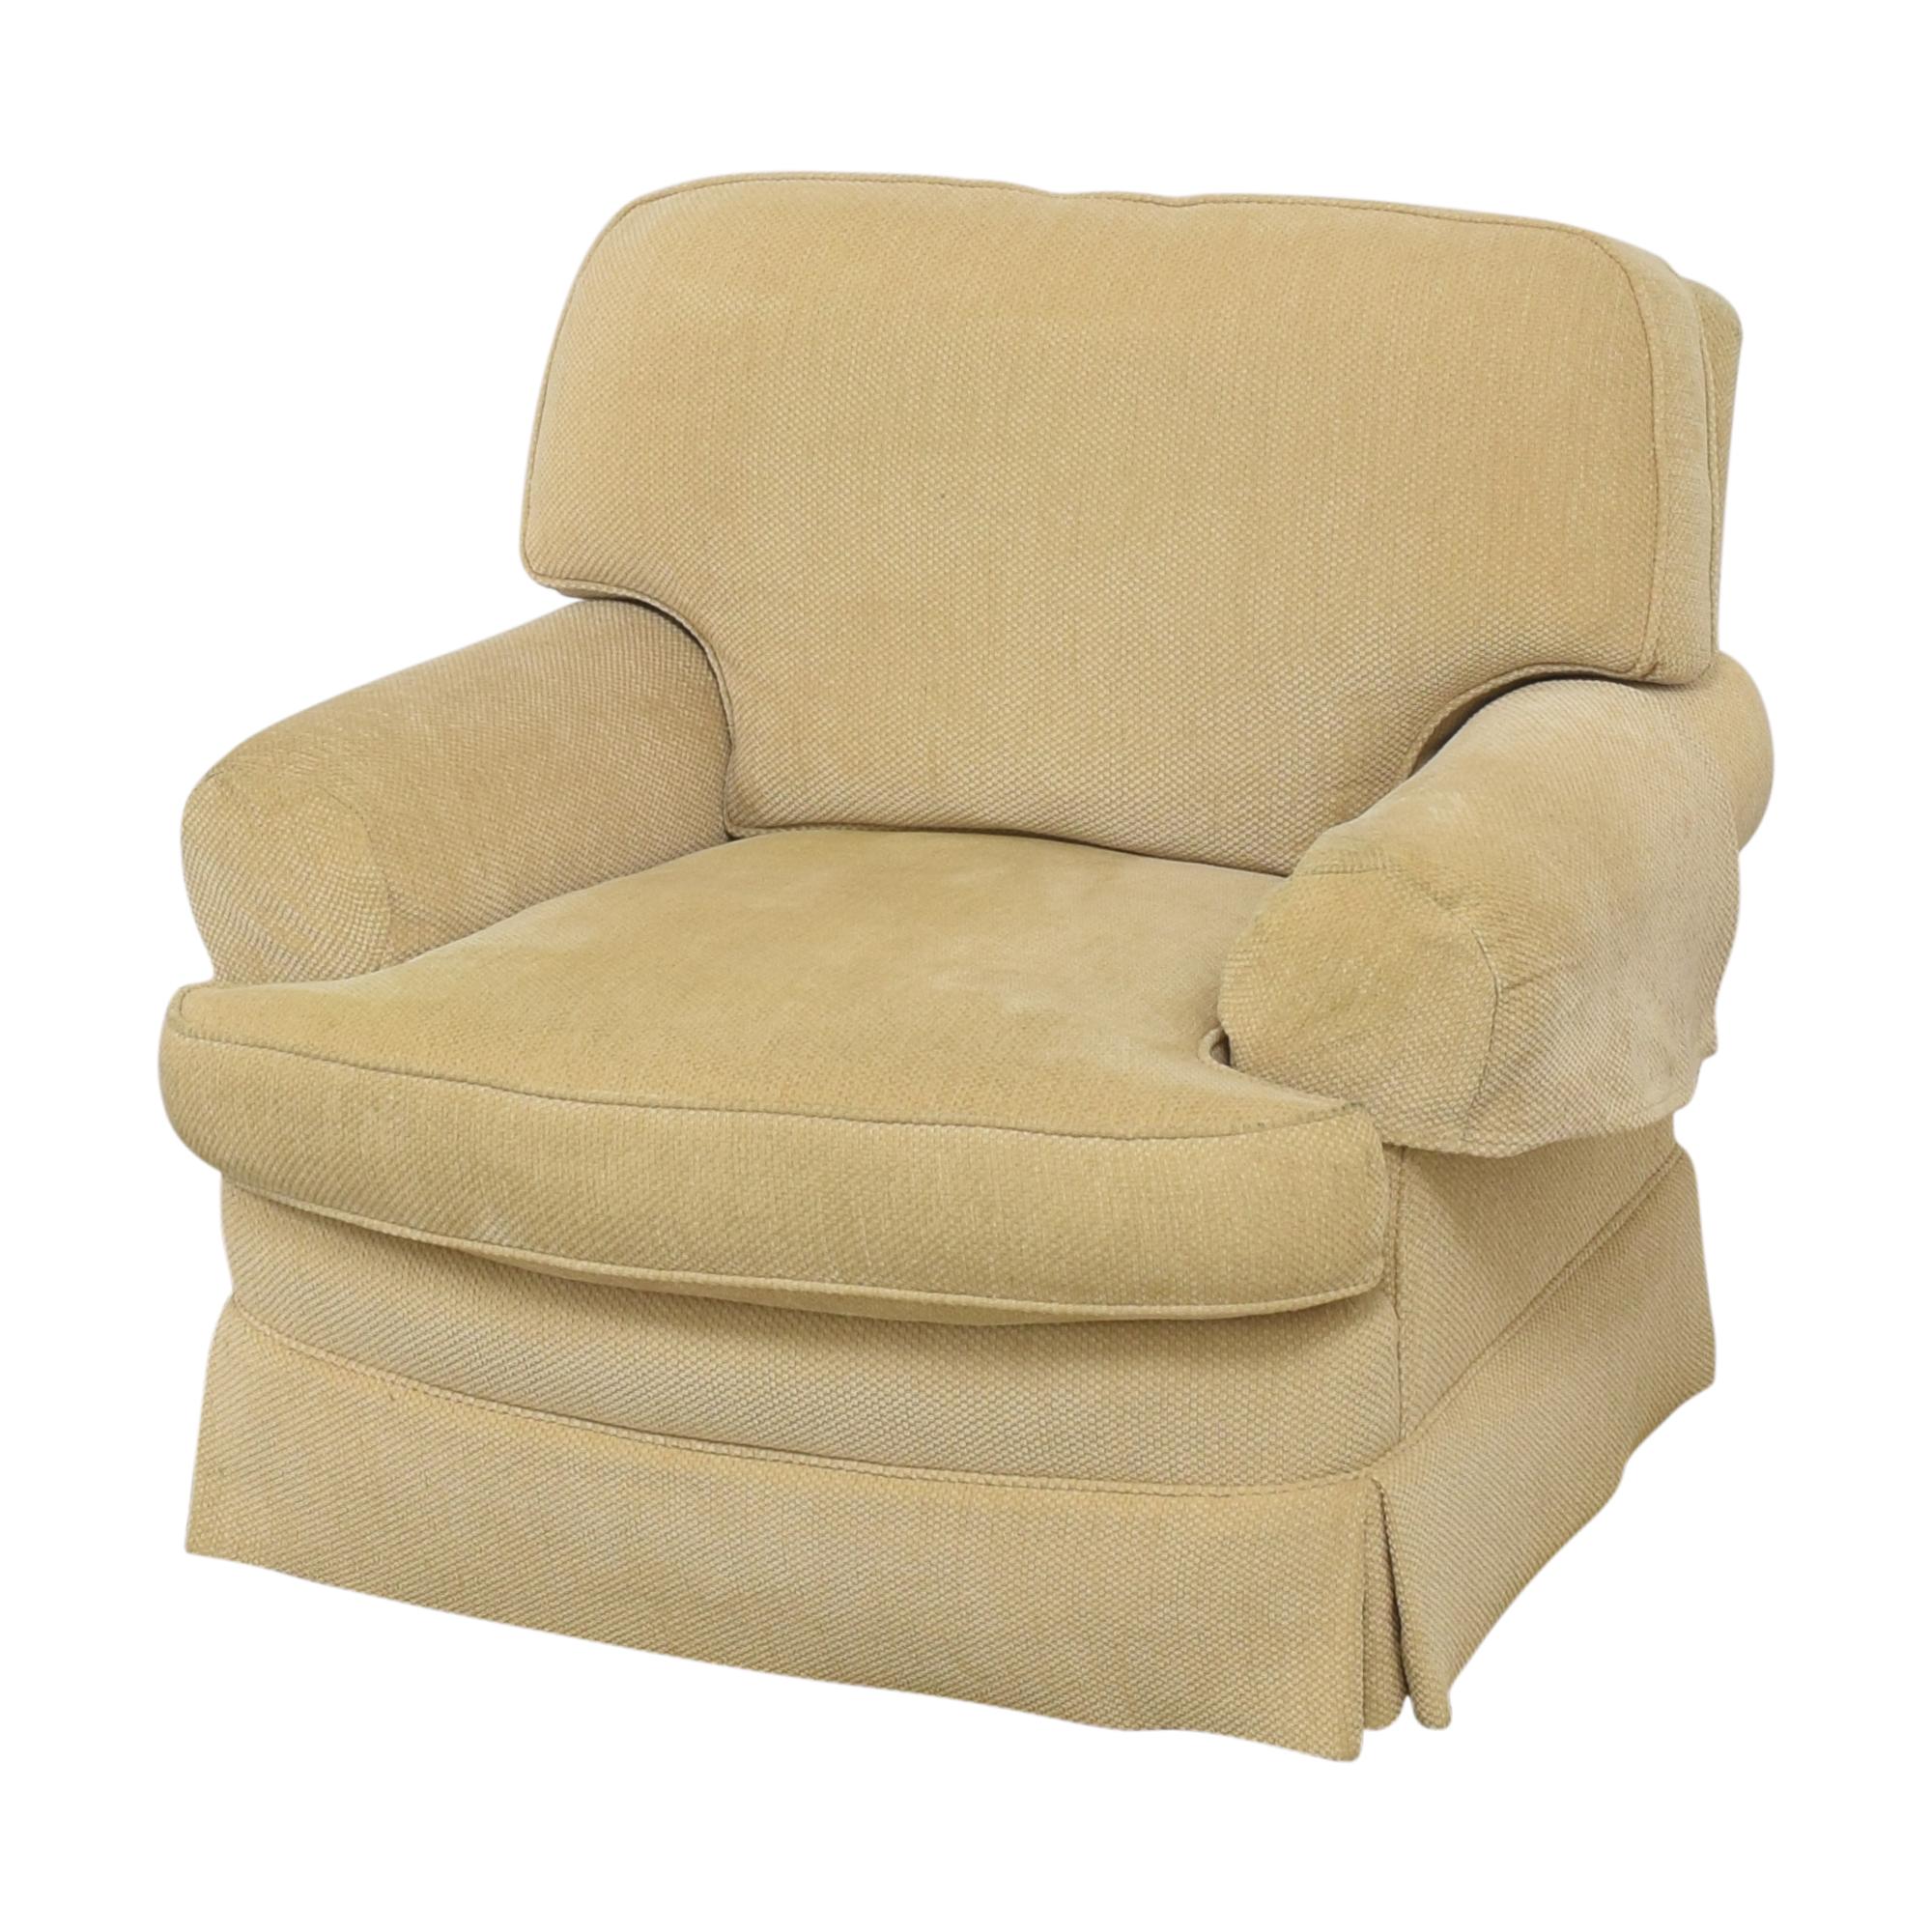 Ralph Lauren Home Ralph Lauren Home Chair with Ottoman used